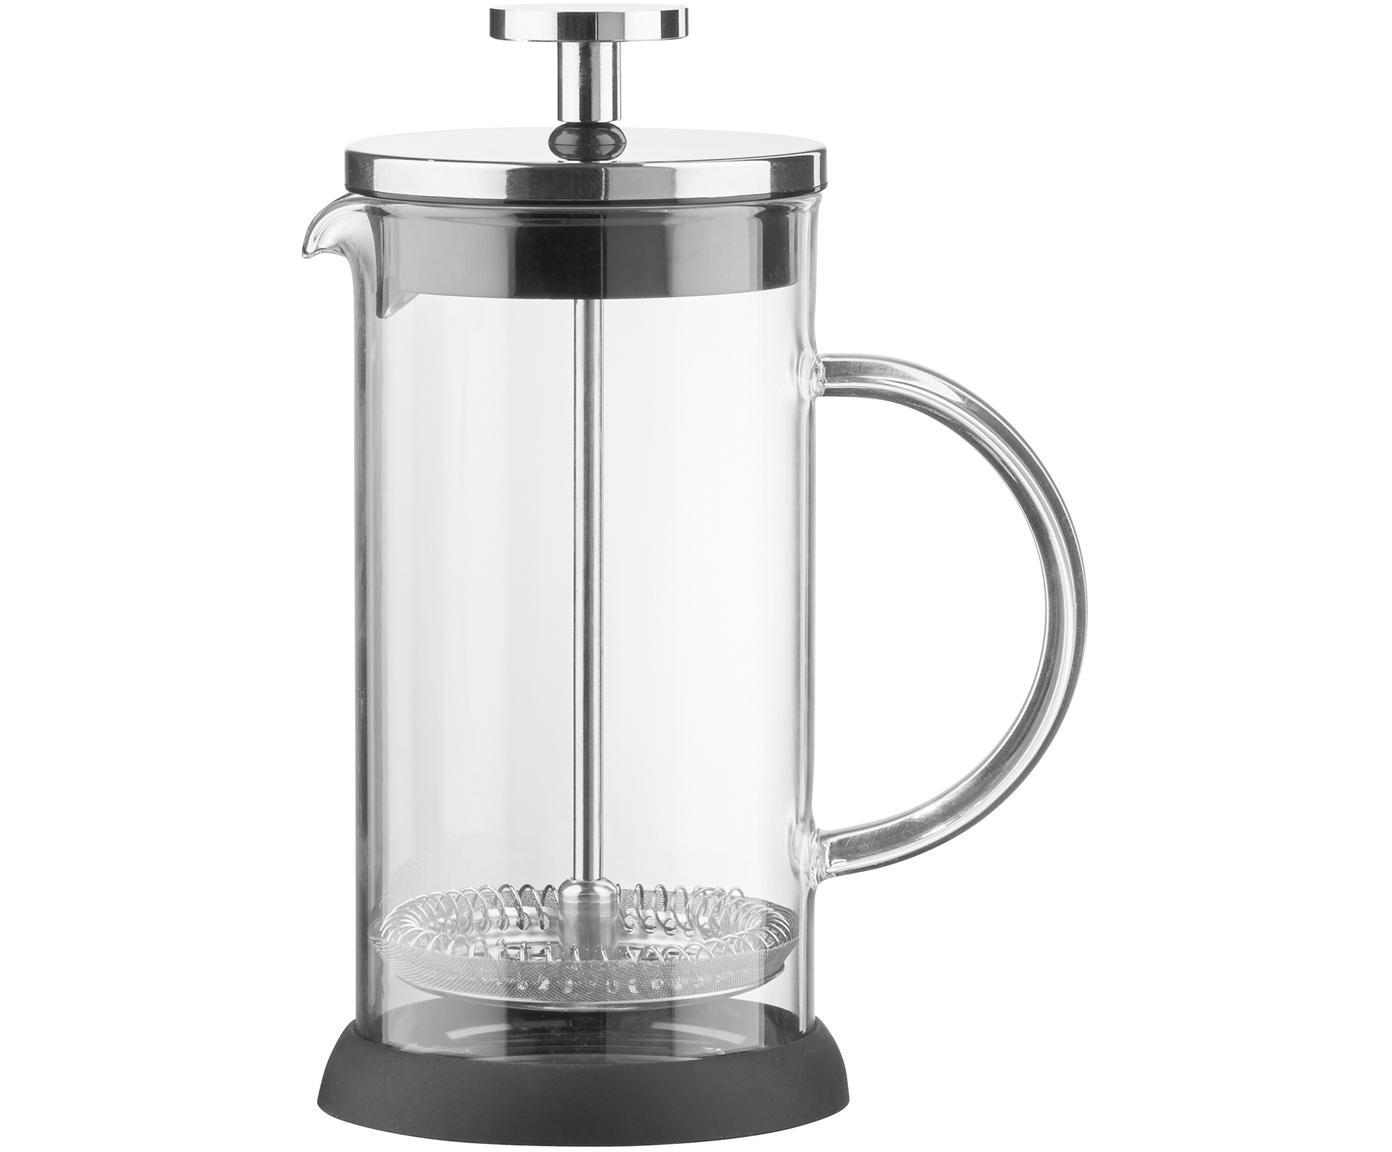 Kaffeezubereiter Beata, Kanne: Borosilikatglas, Transparent, Edelstahl, Schwarz, Ø 14 x H 22 cm